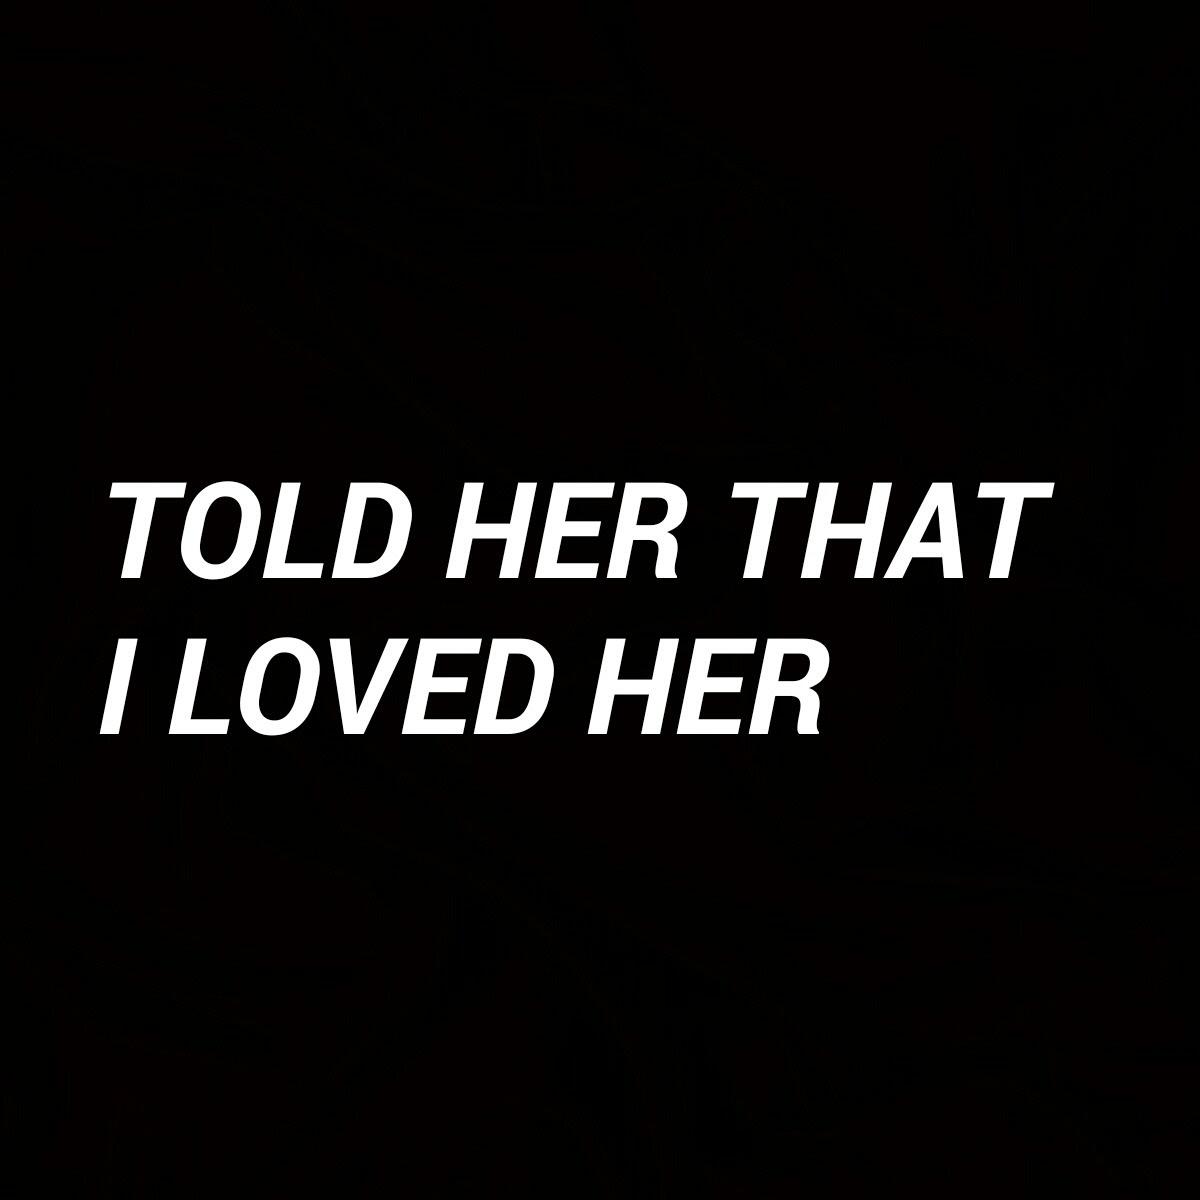 Love Quote Black And White Depressed Depression Quotes Lyrics My